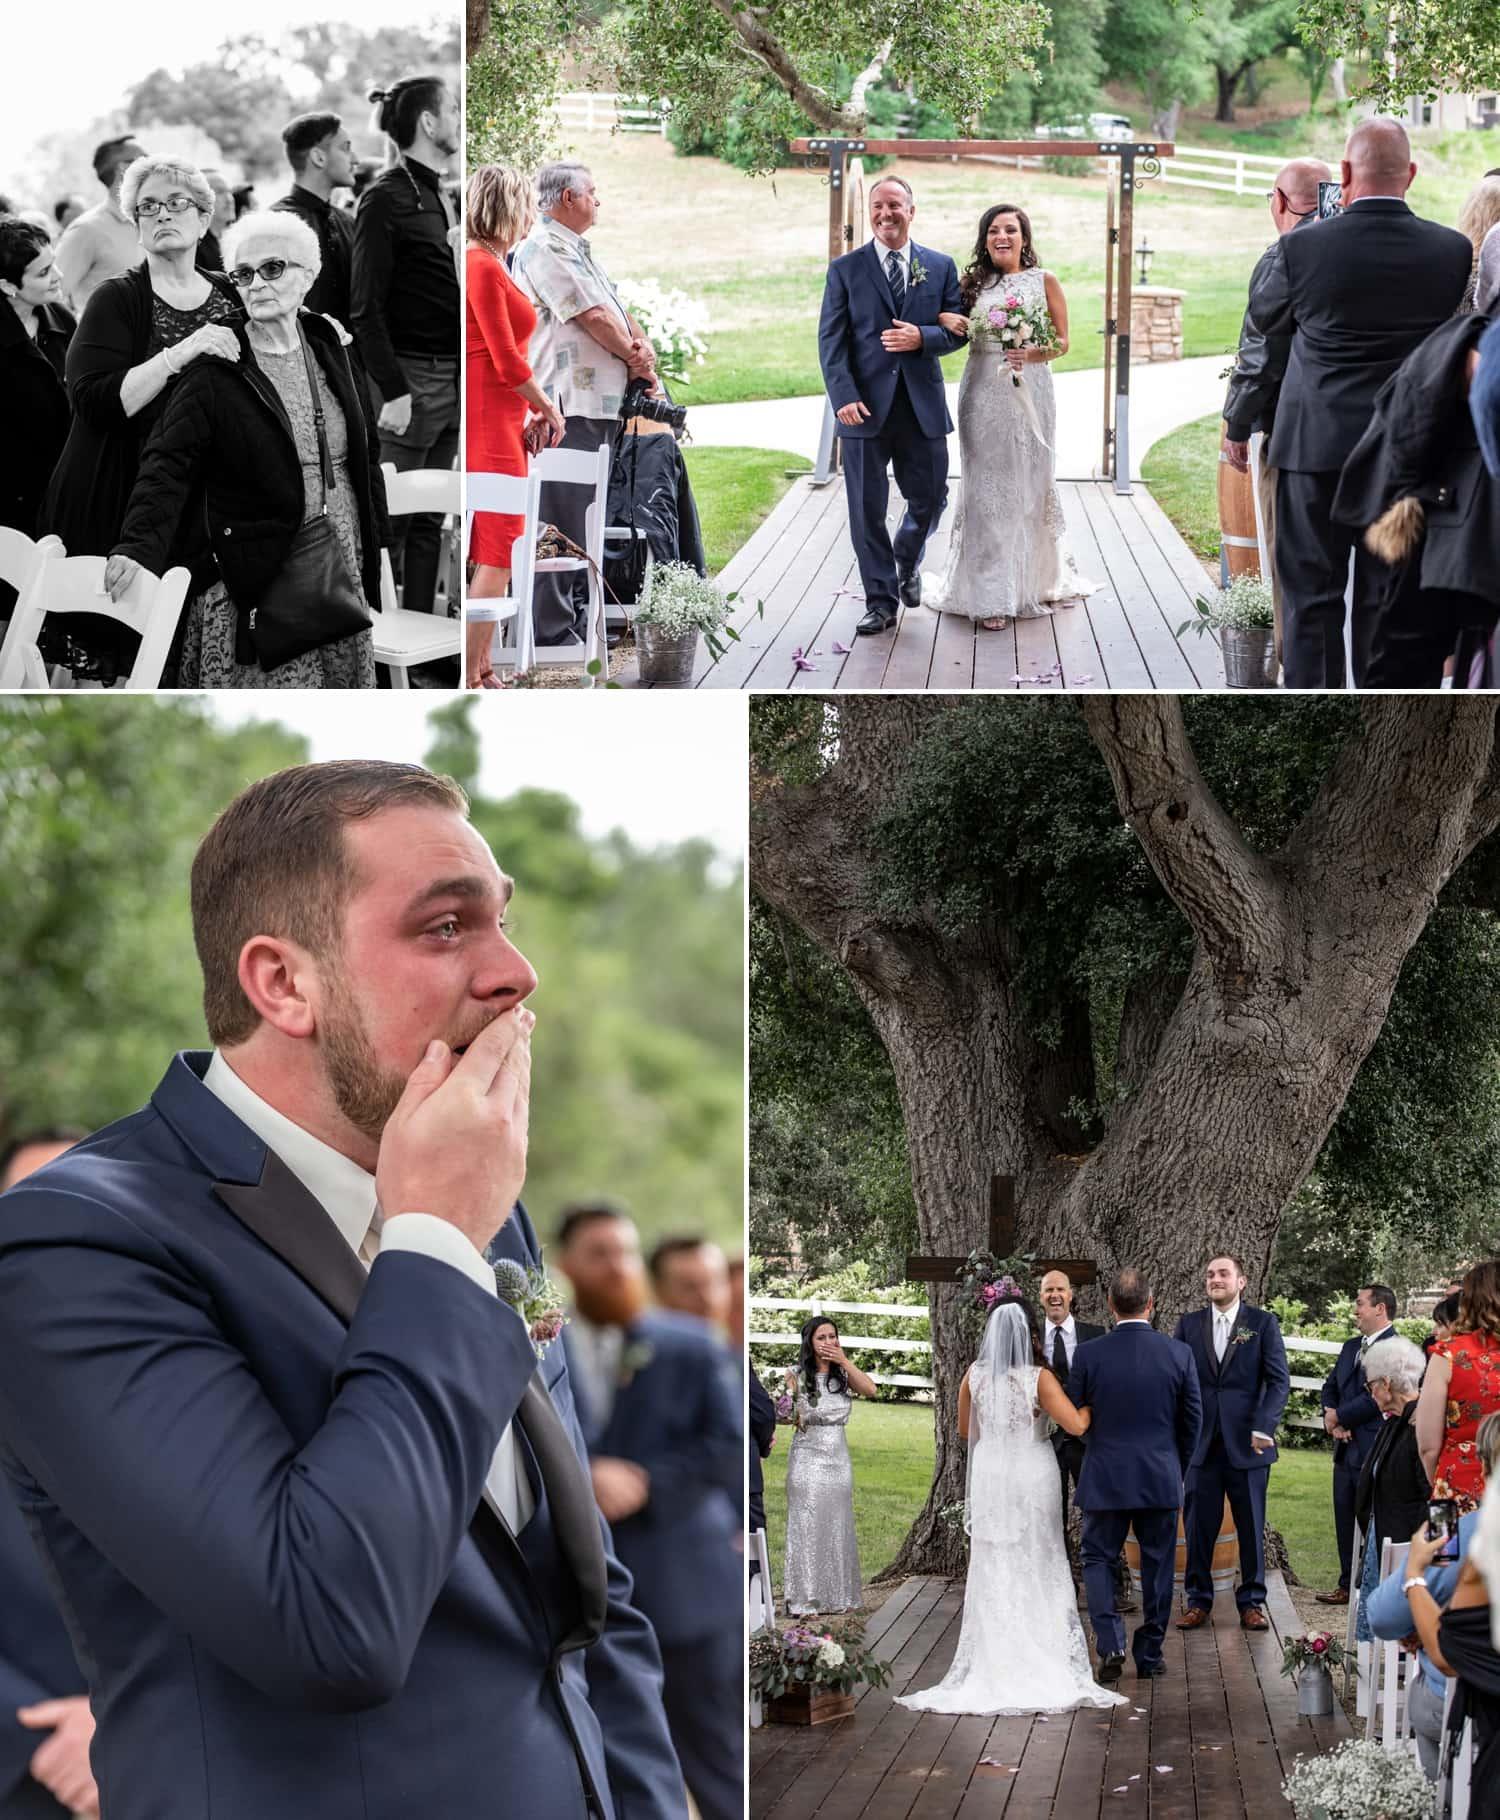 Wedding ceremony at Circle Oak Ranch in Temecula.